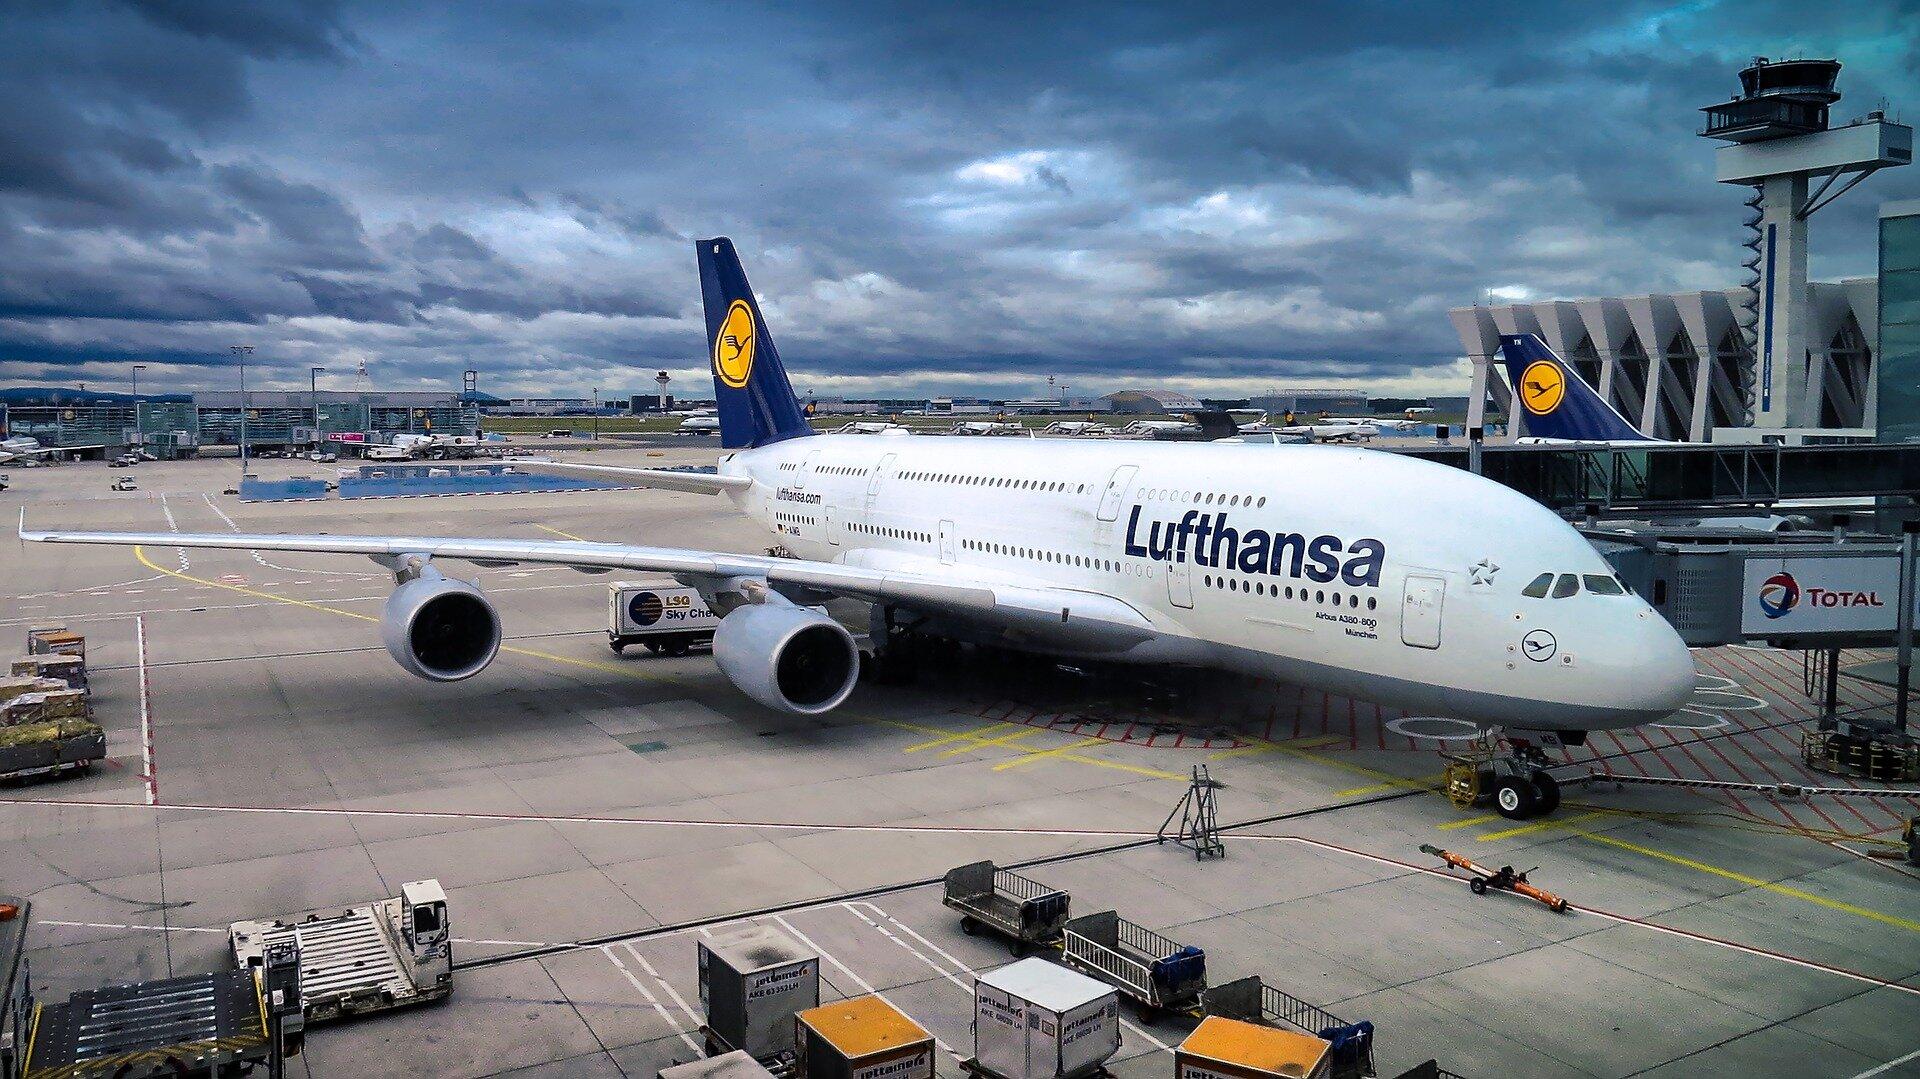 लुफ्थांसा एयरलाइन (Lufthansa)